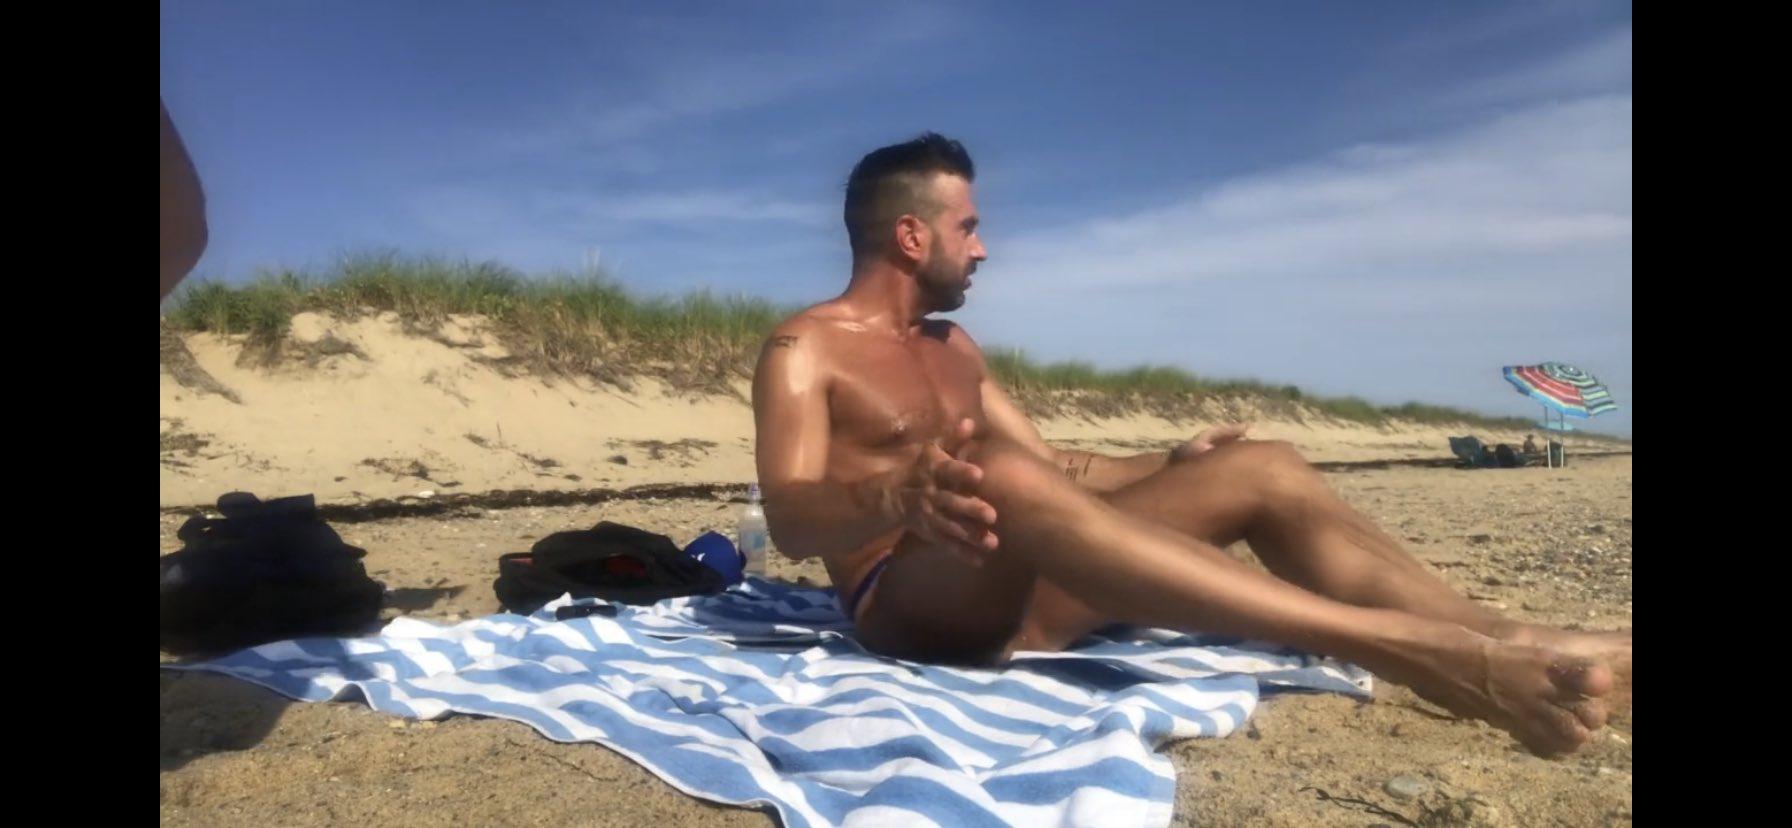 padre e hijo en la playa con poca ropa